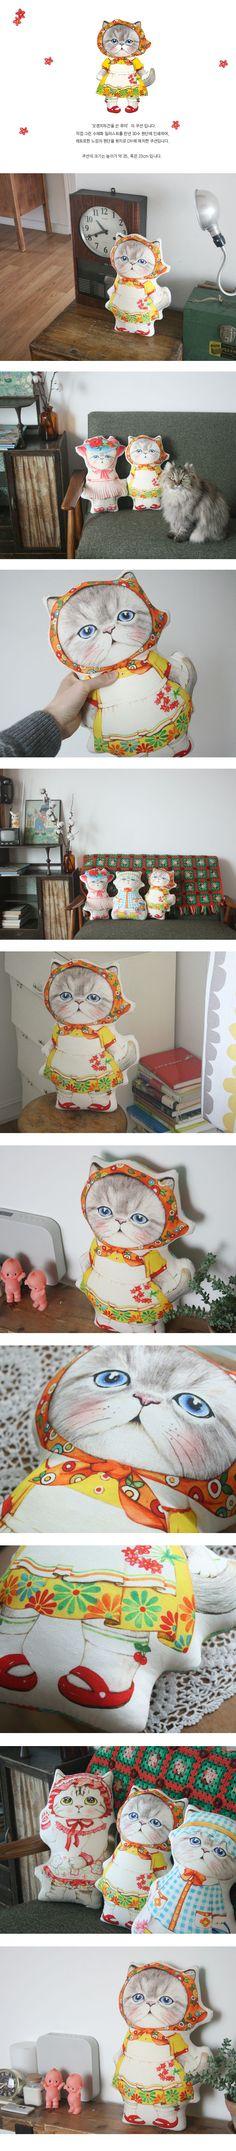 Cat persian uncle cat himalayan fabric doll plush pillow cushion pet kitten kitty